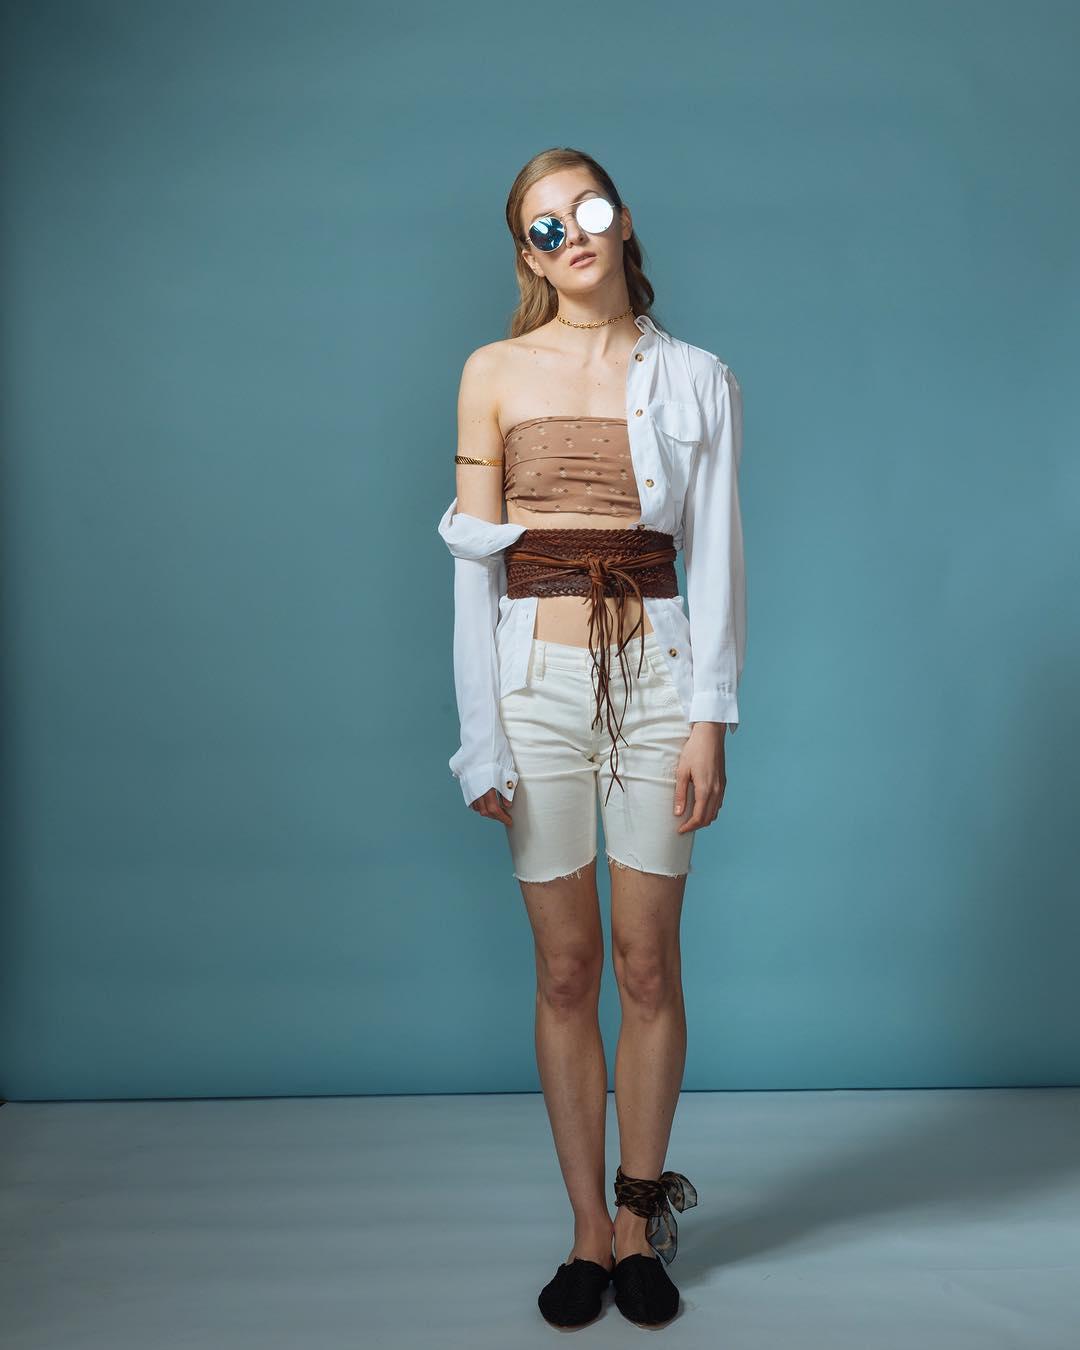 Morra Designs, press, Estela magazine, placement